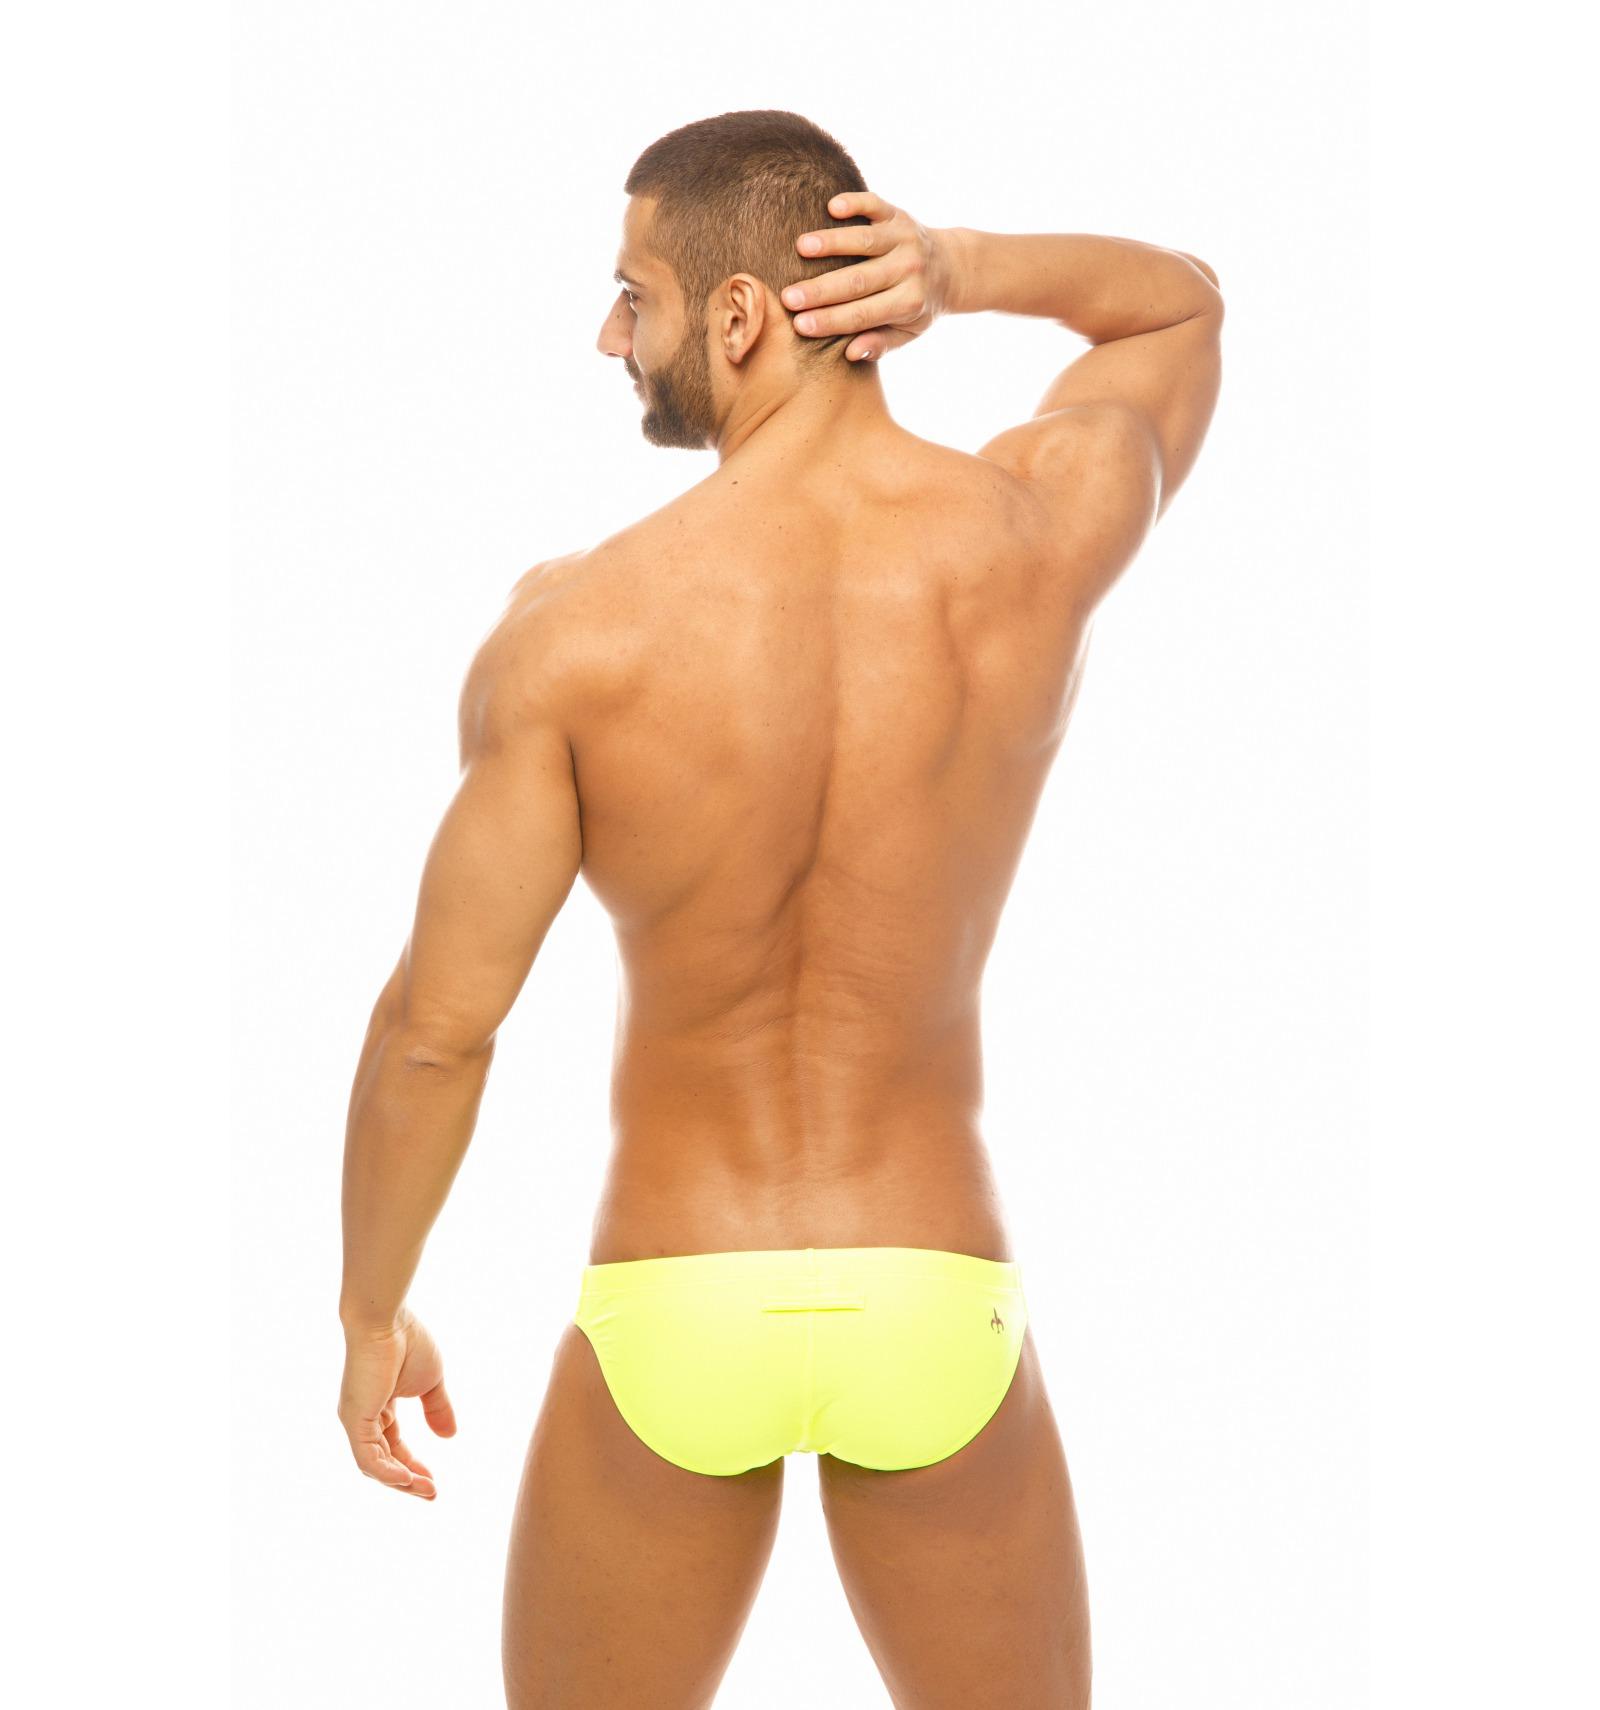 Marcuse Swimwear Inflate Neon Yellow